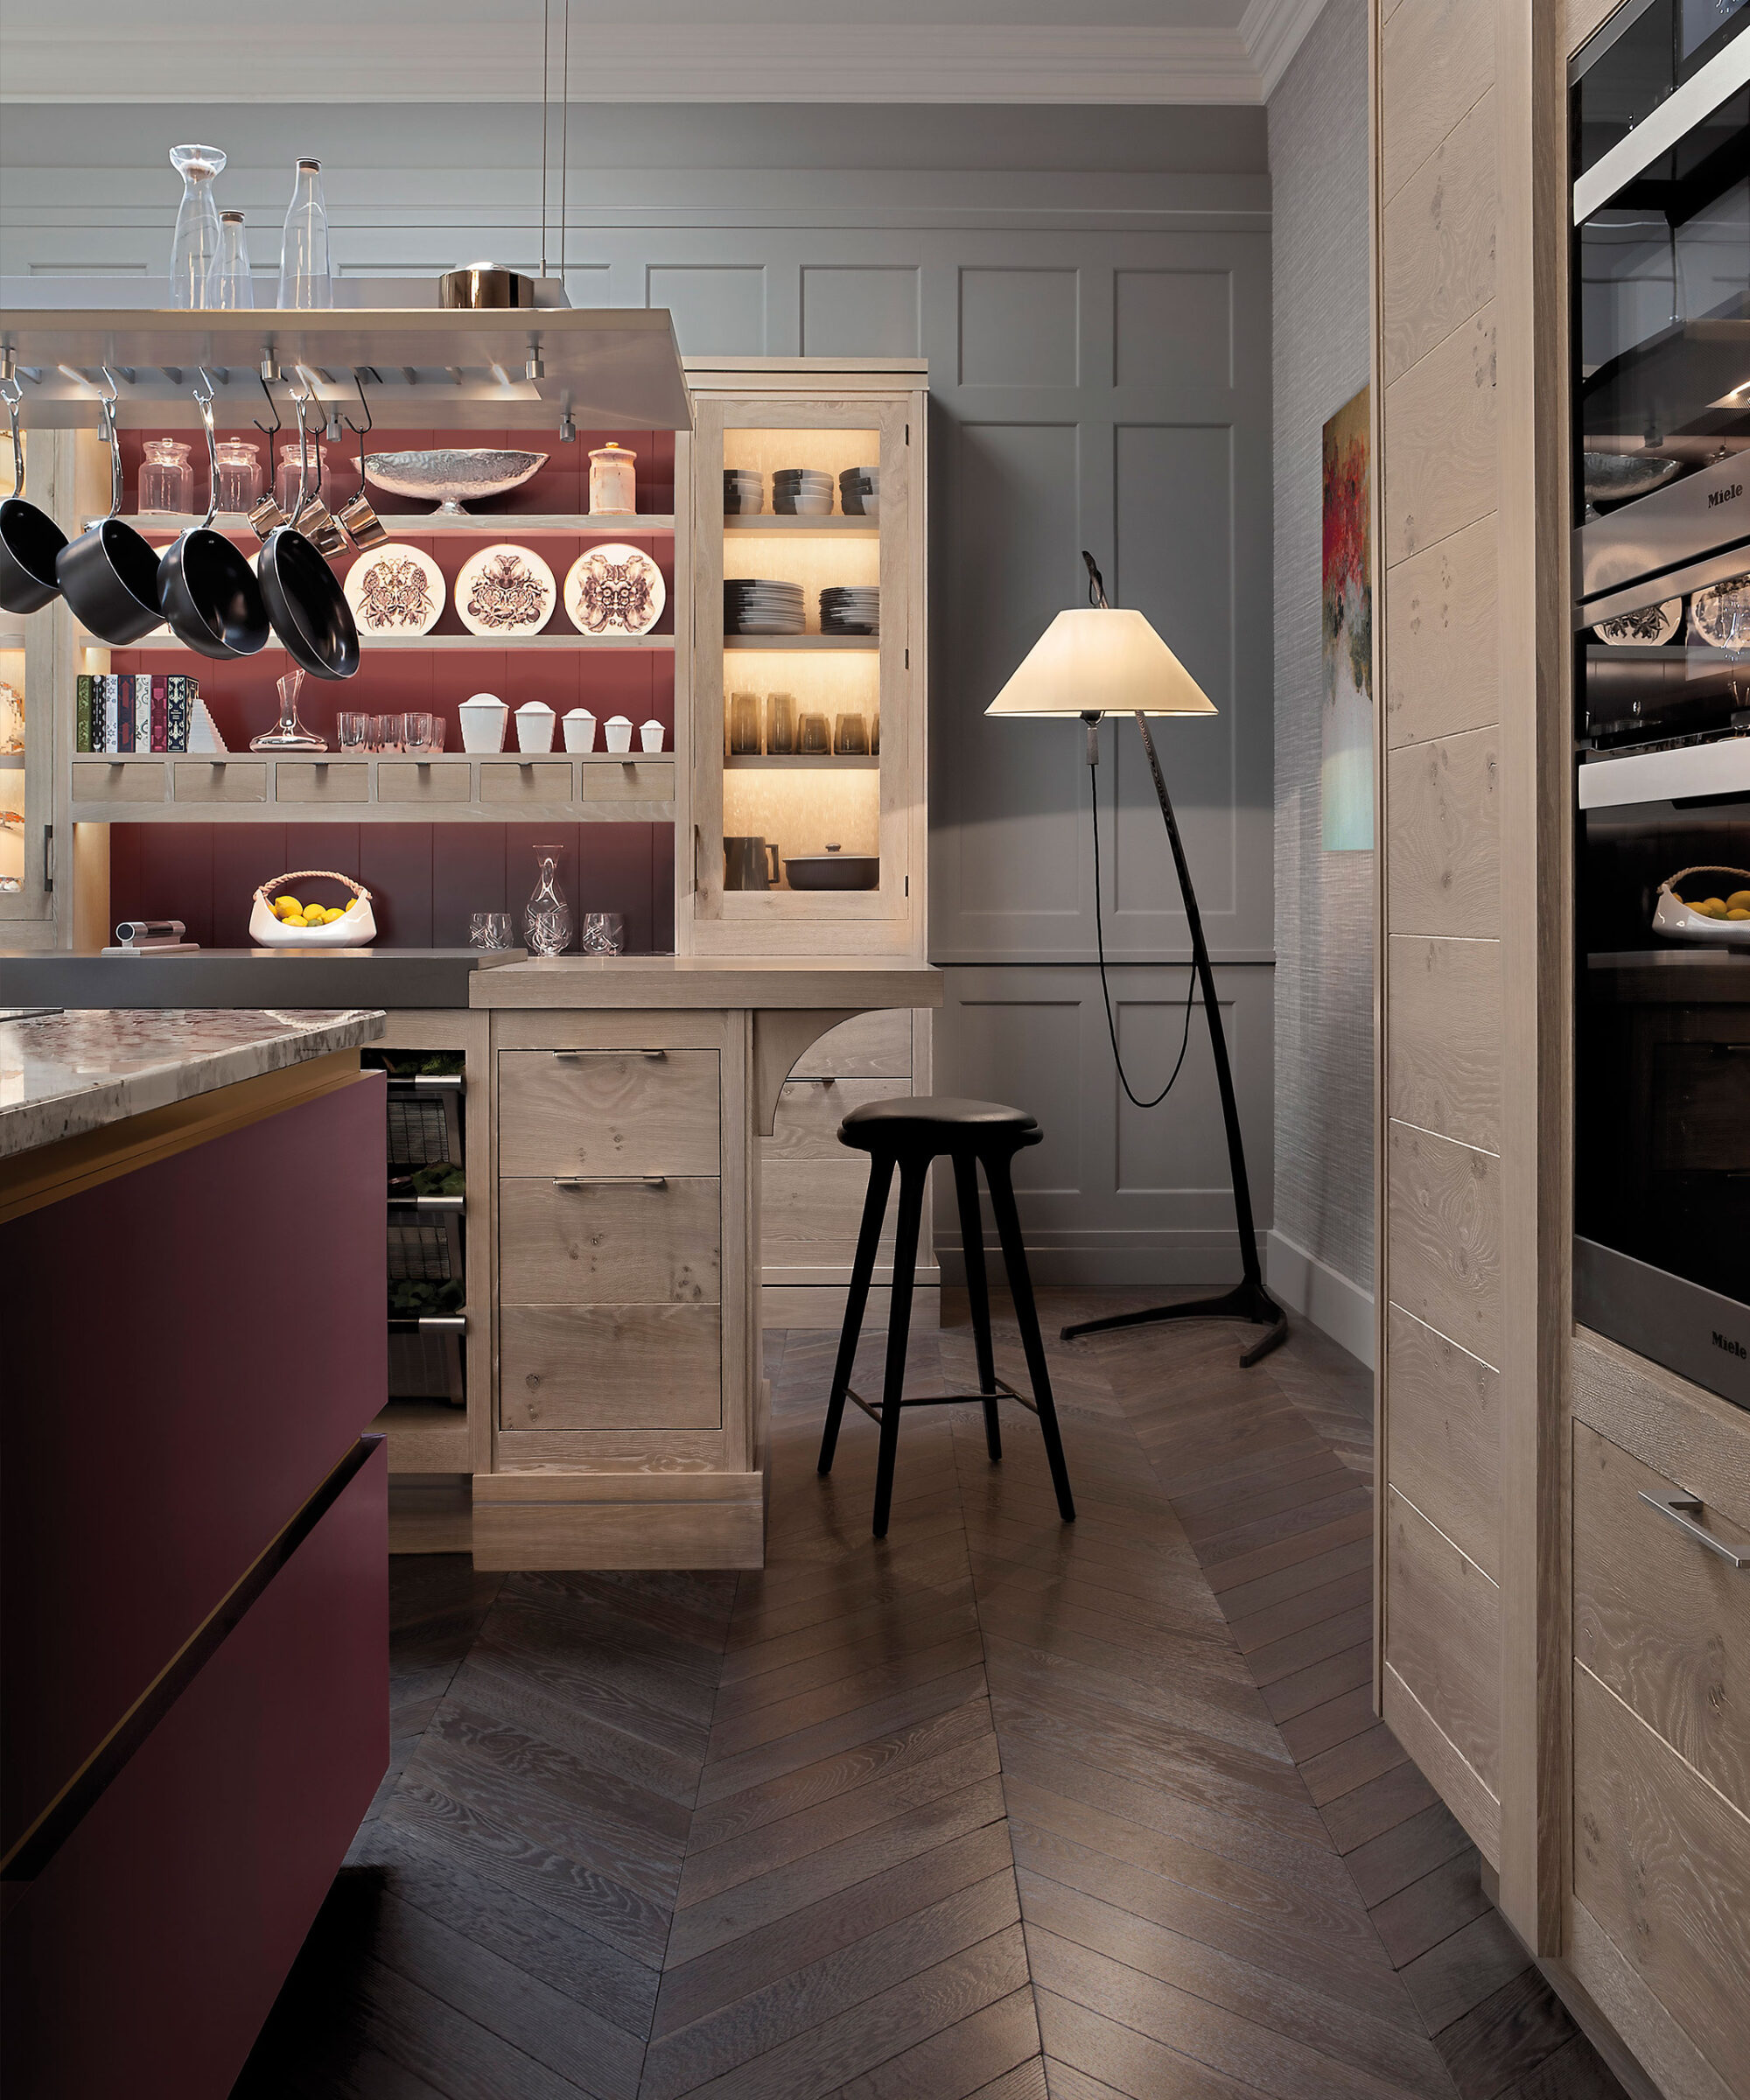 a smallbone brasserie kitchen with modernist central island in plum colour